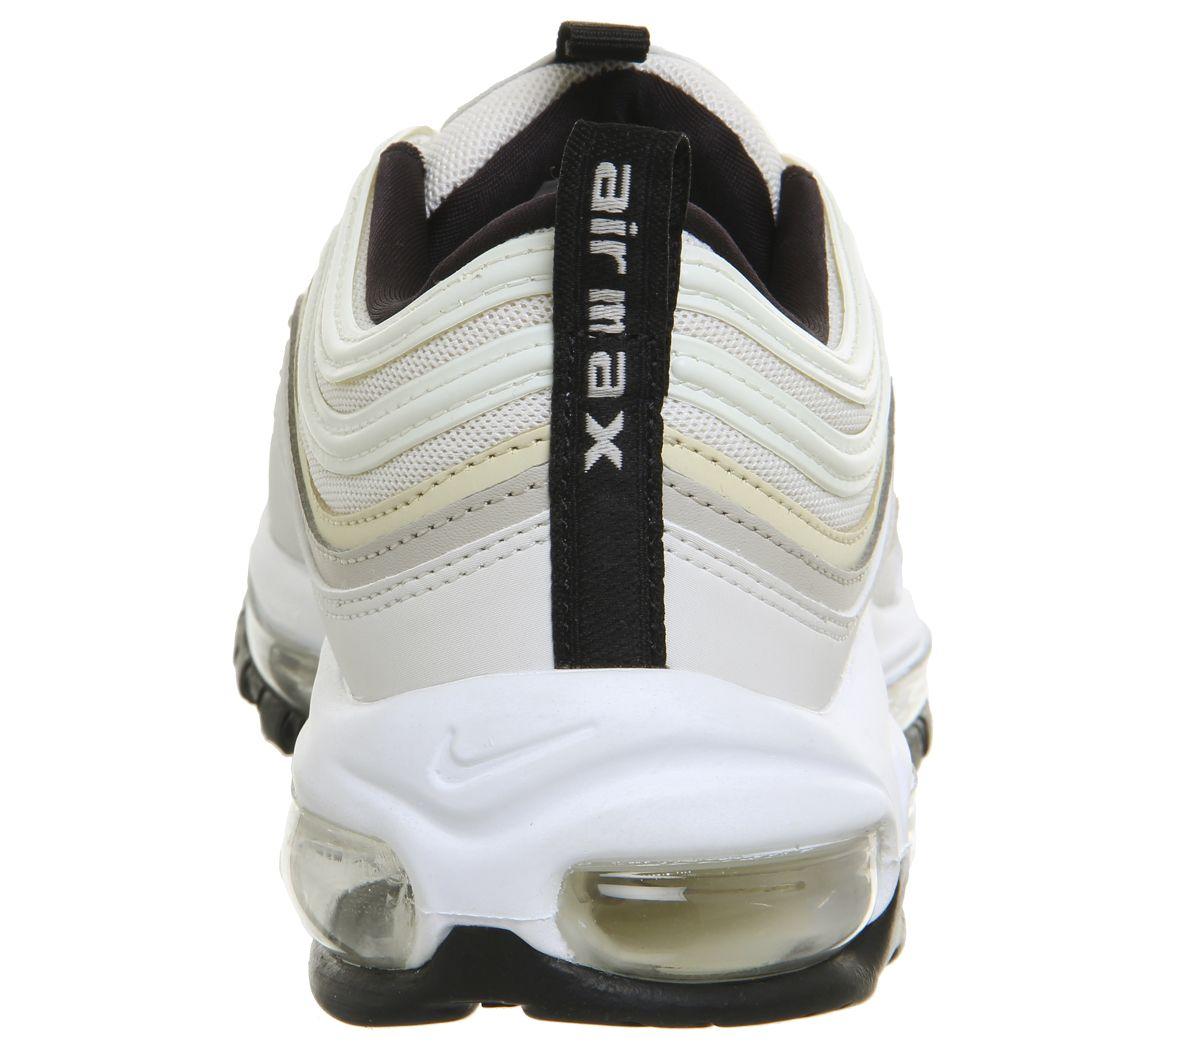 255971ddb1 Nike Air Max 97 Trainers Phantom Beach Desert Sand F - Hers trainers